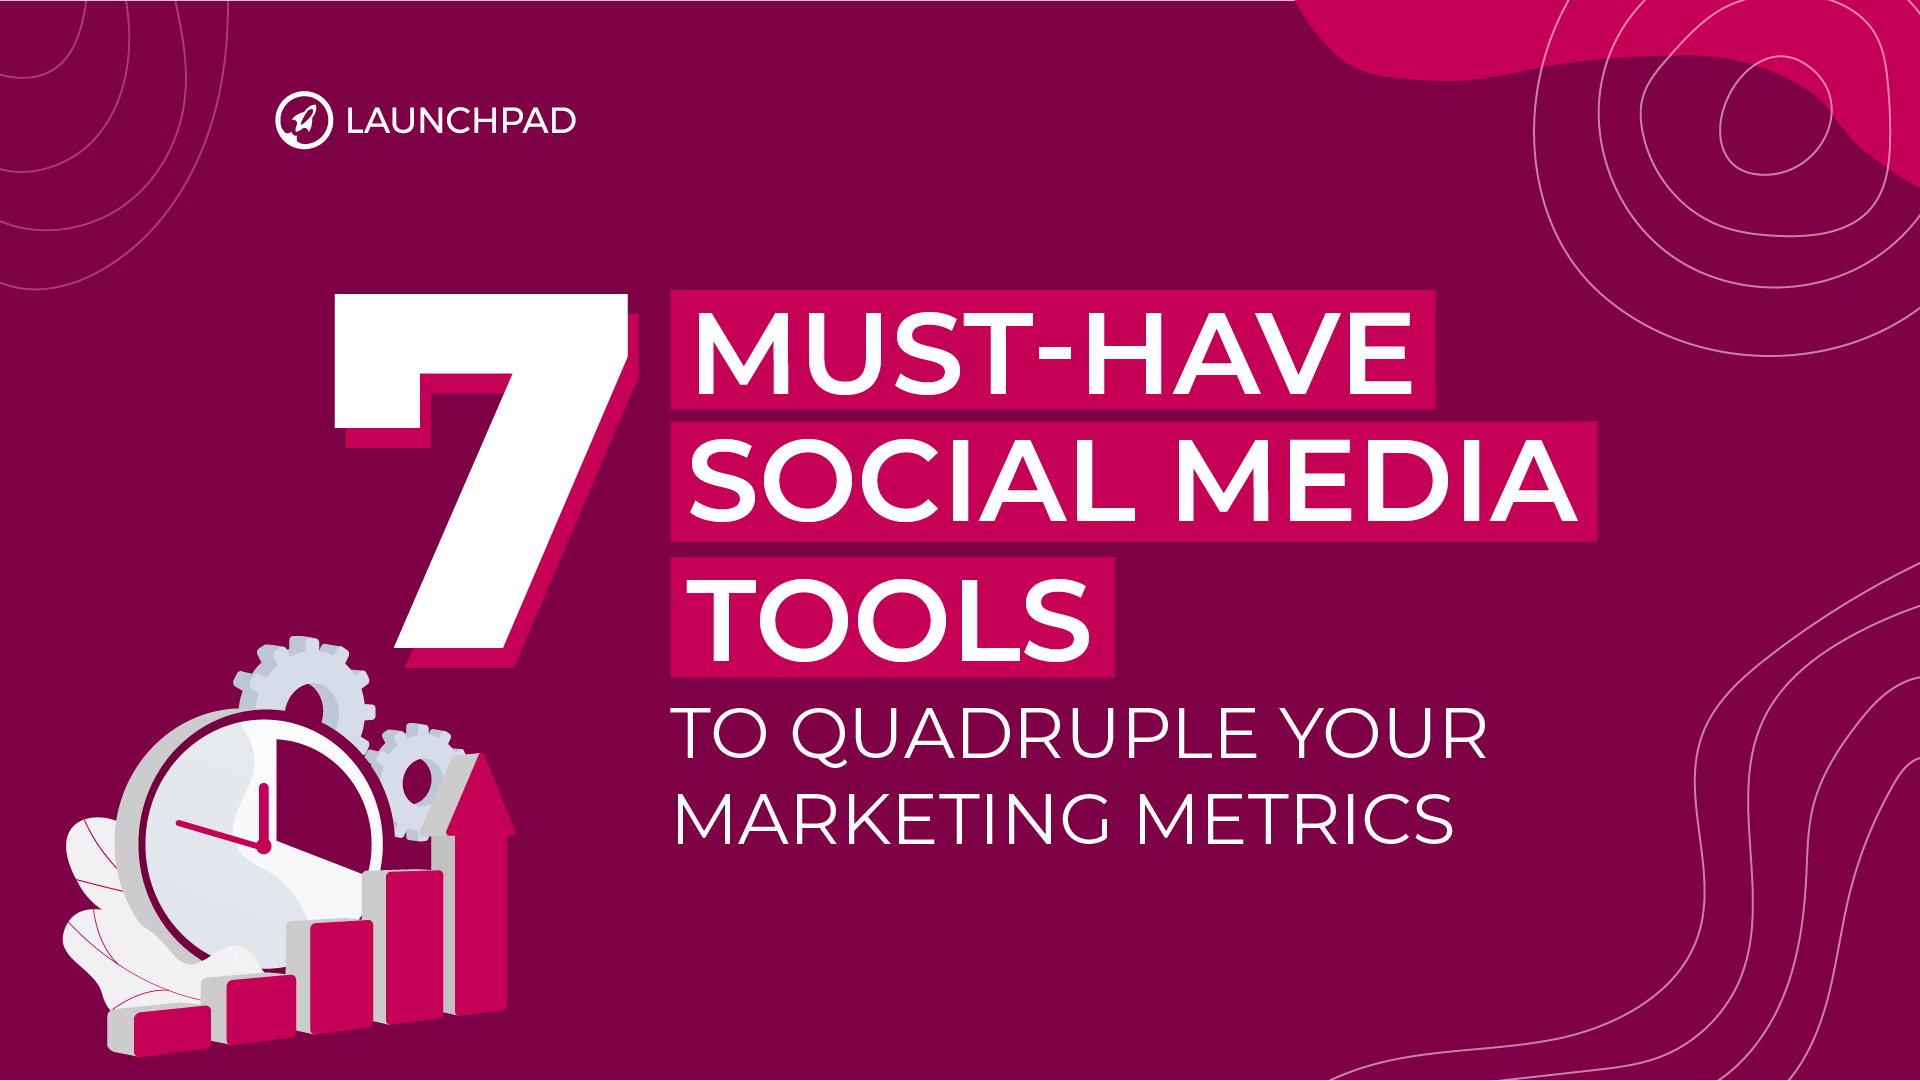 Blog[SM]-7 Must-Have Social Media Tools to Quadruple Your Marketing Metrics-02